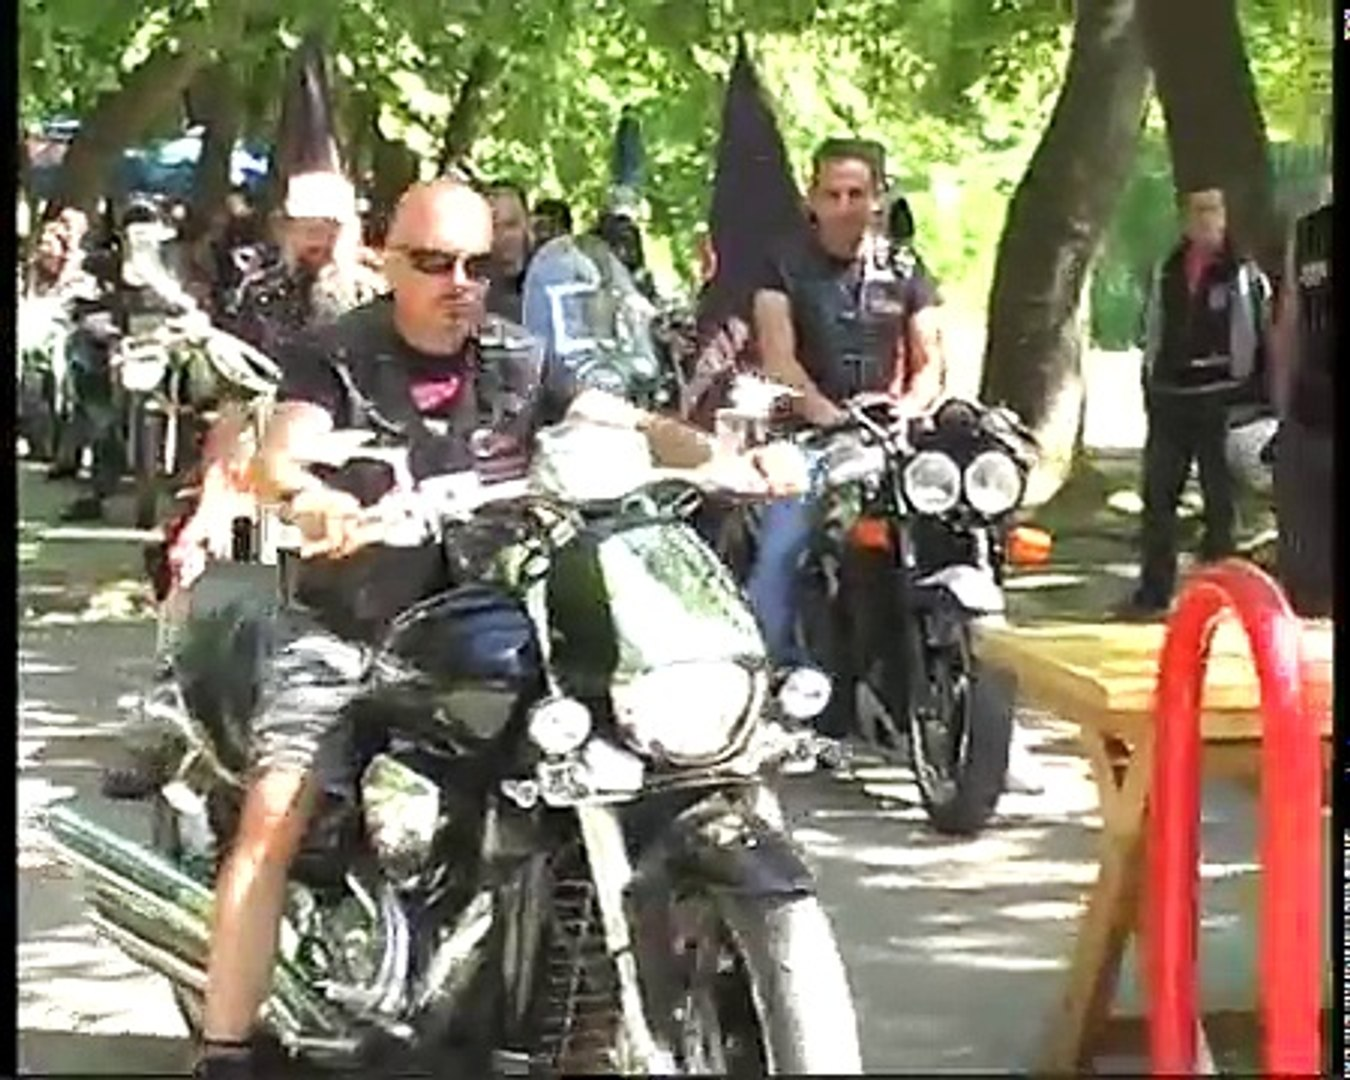 HQ Video 9th Anniversary NIGHT WOLVES MG -Moto Club Macedonia